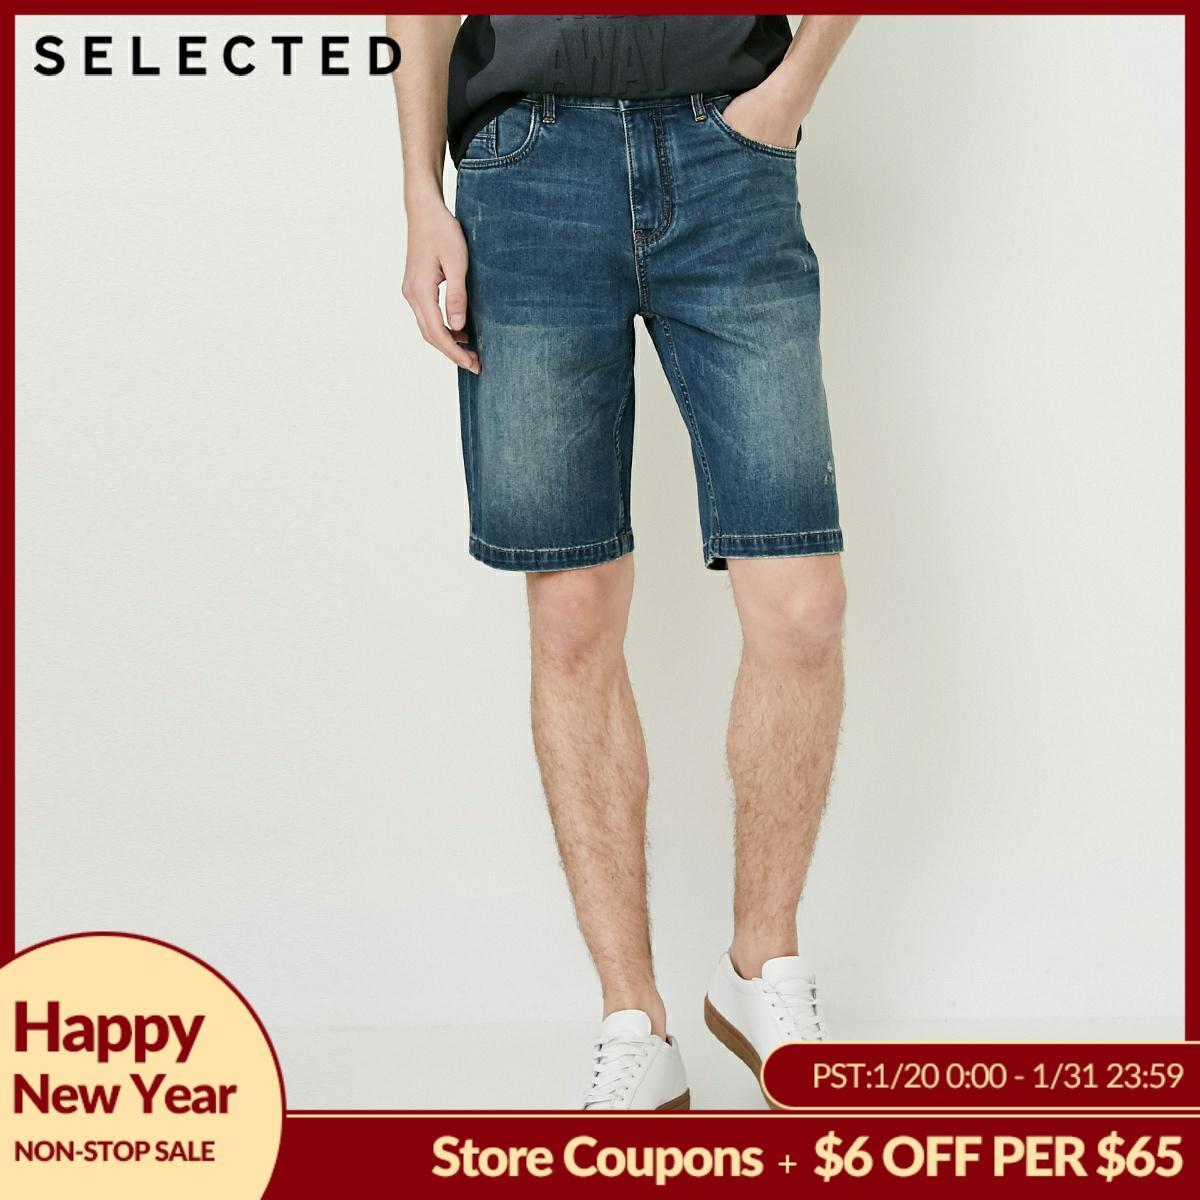 SELECTED Men Shorts Cotton-blend Washed Leisure Breeches Jean Summer Denim Shorts Streetwear C|4182S3511